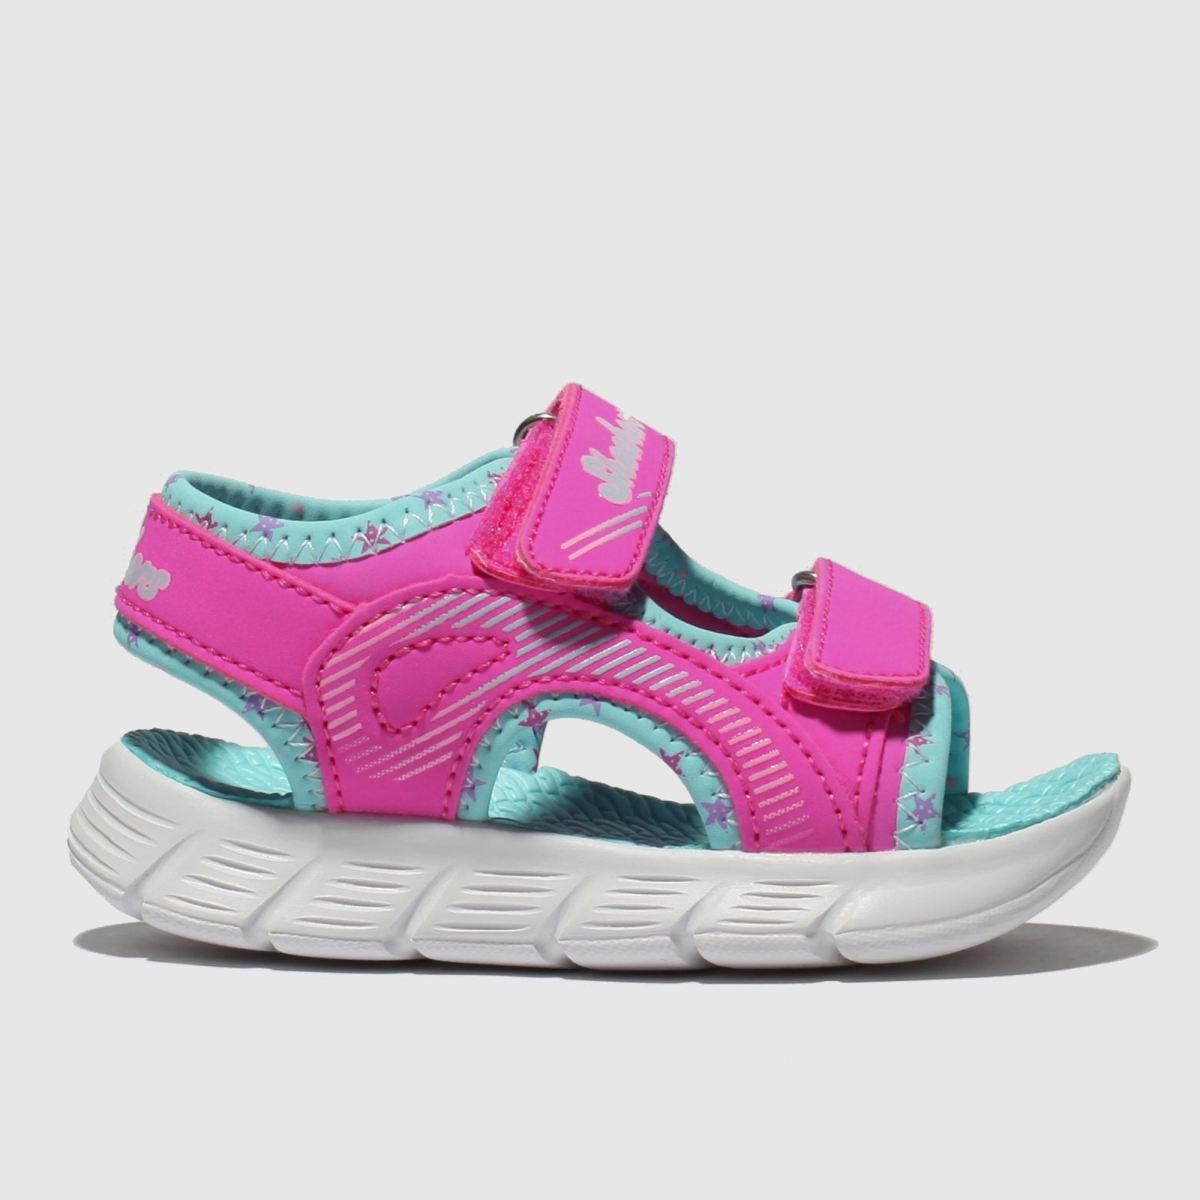 Skechers Pink C-flex Sandals Toddler